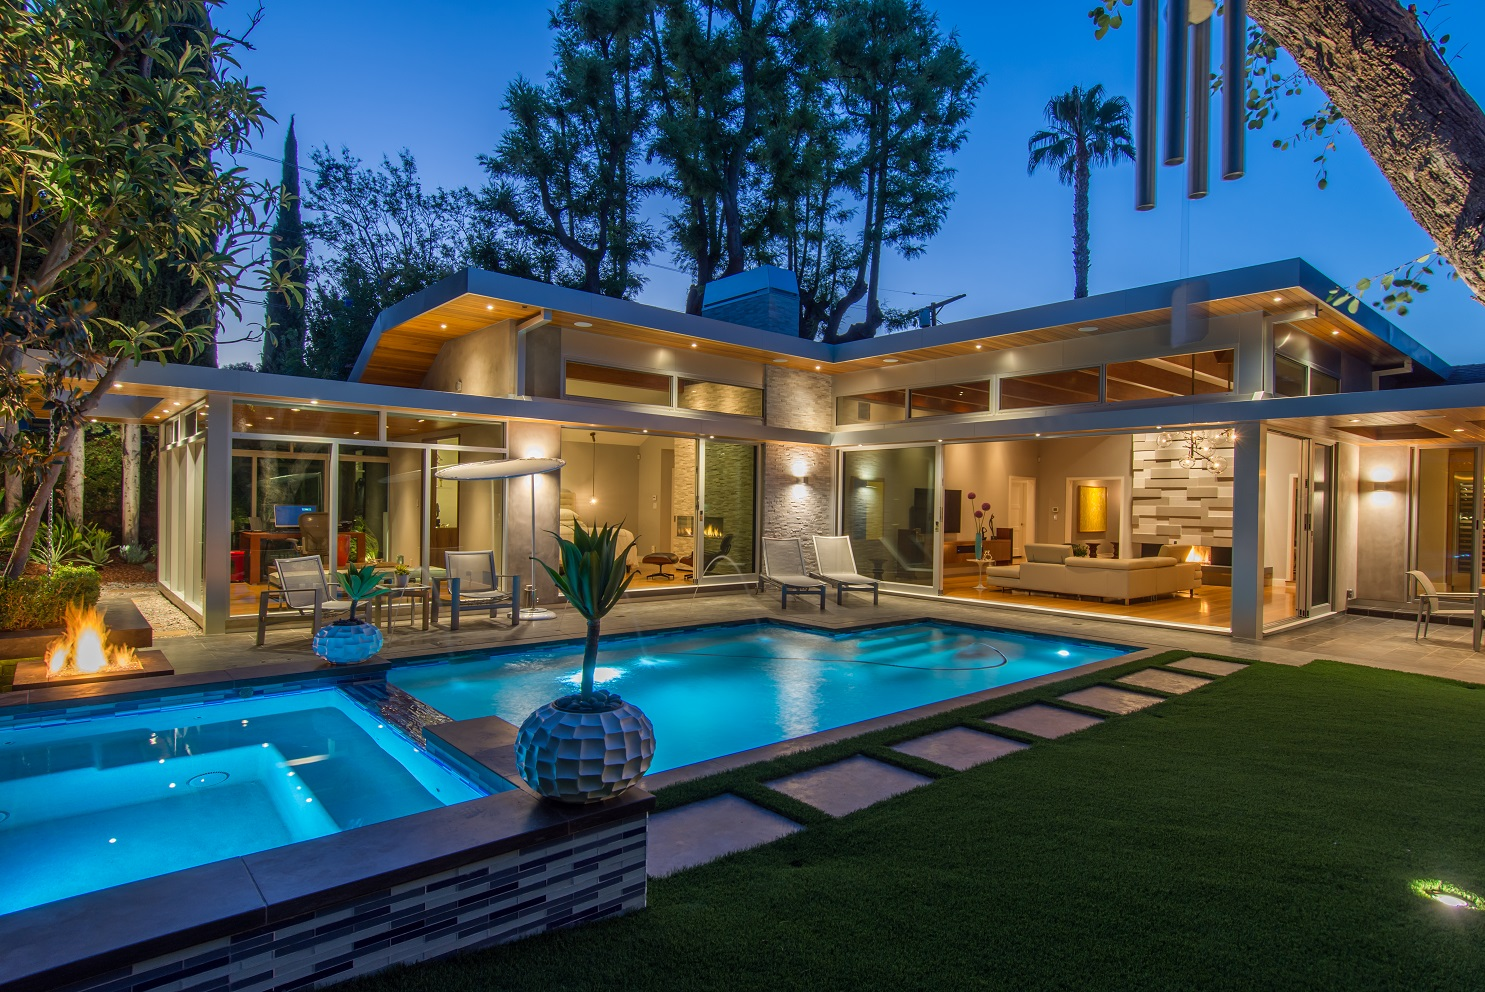 studio-saint-residential-design-los-angeles-residence-11